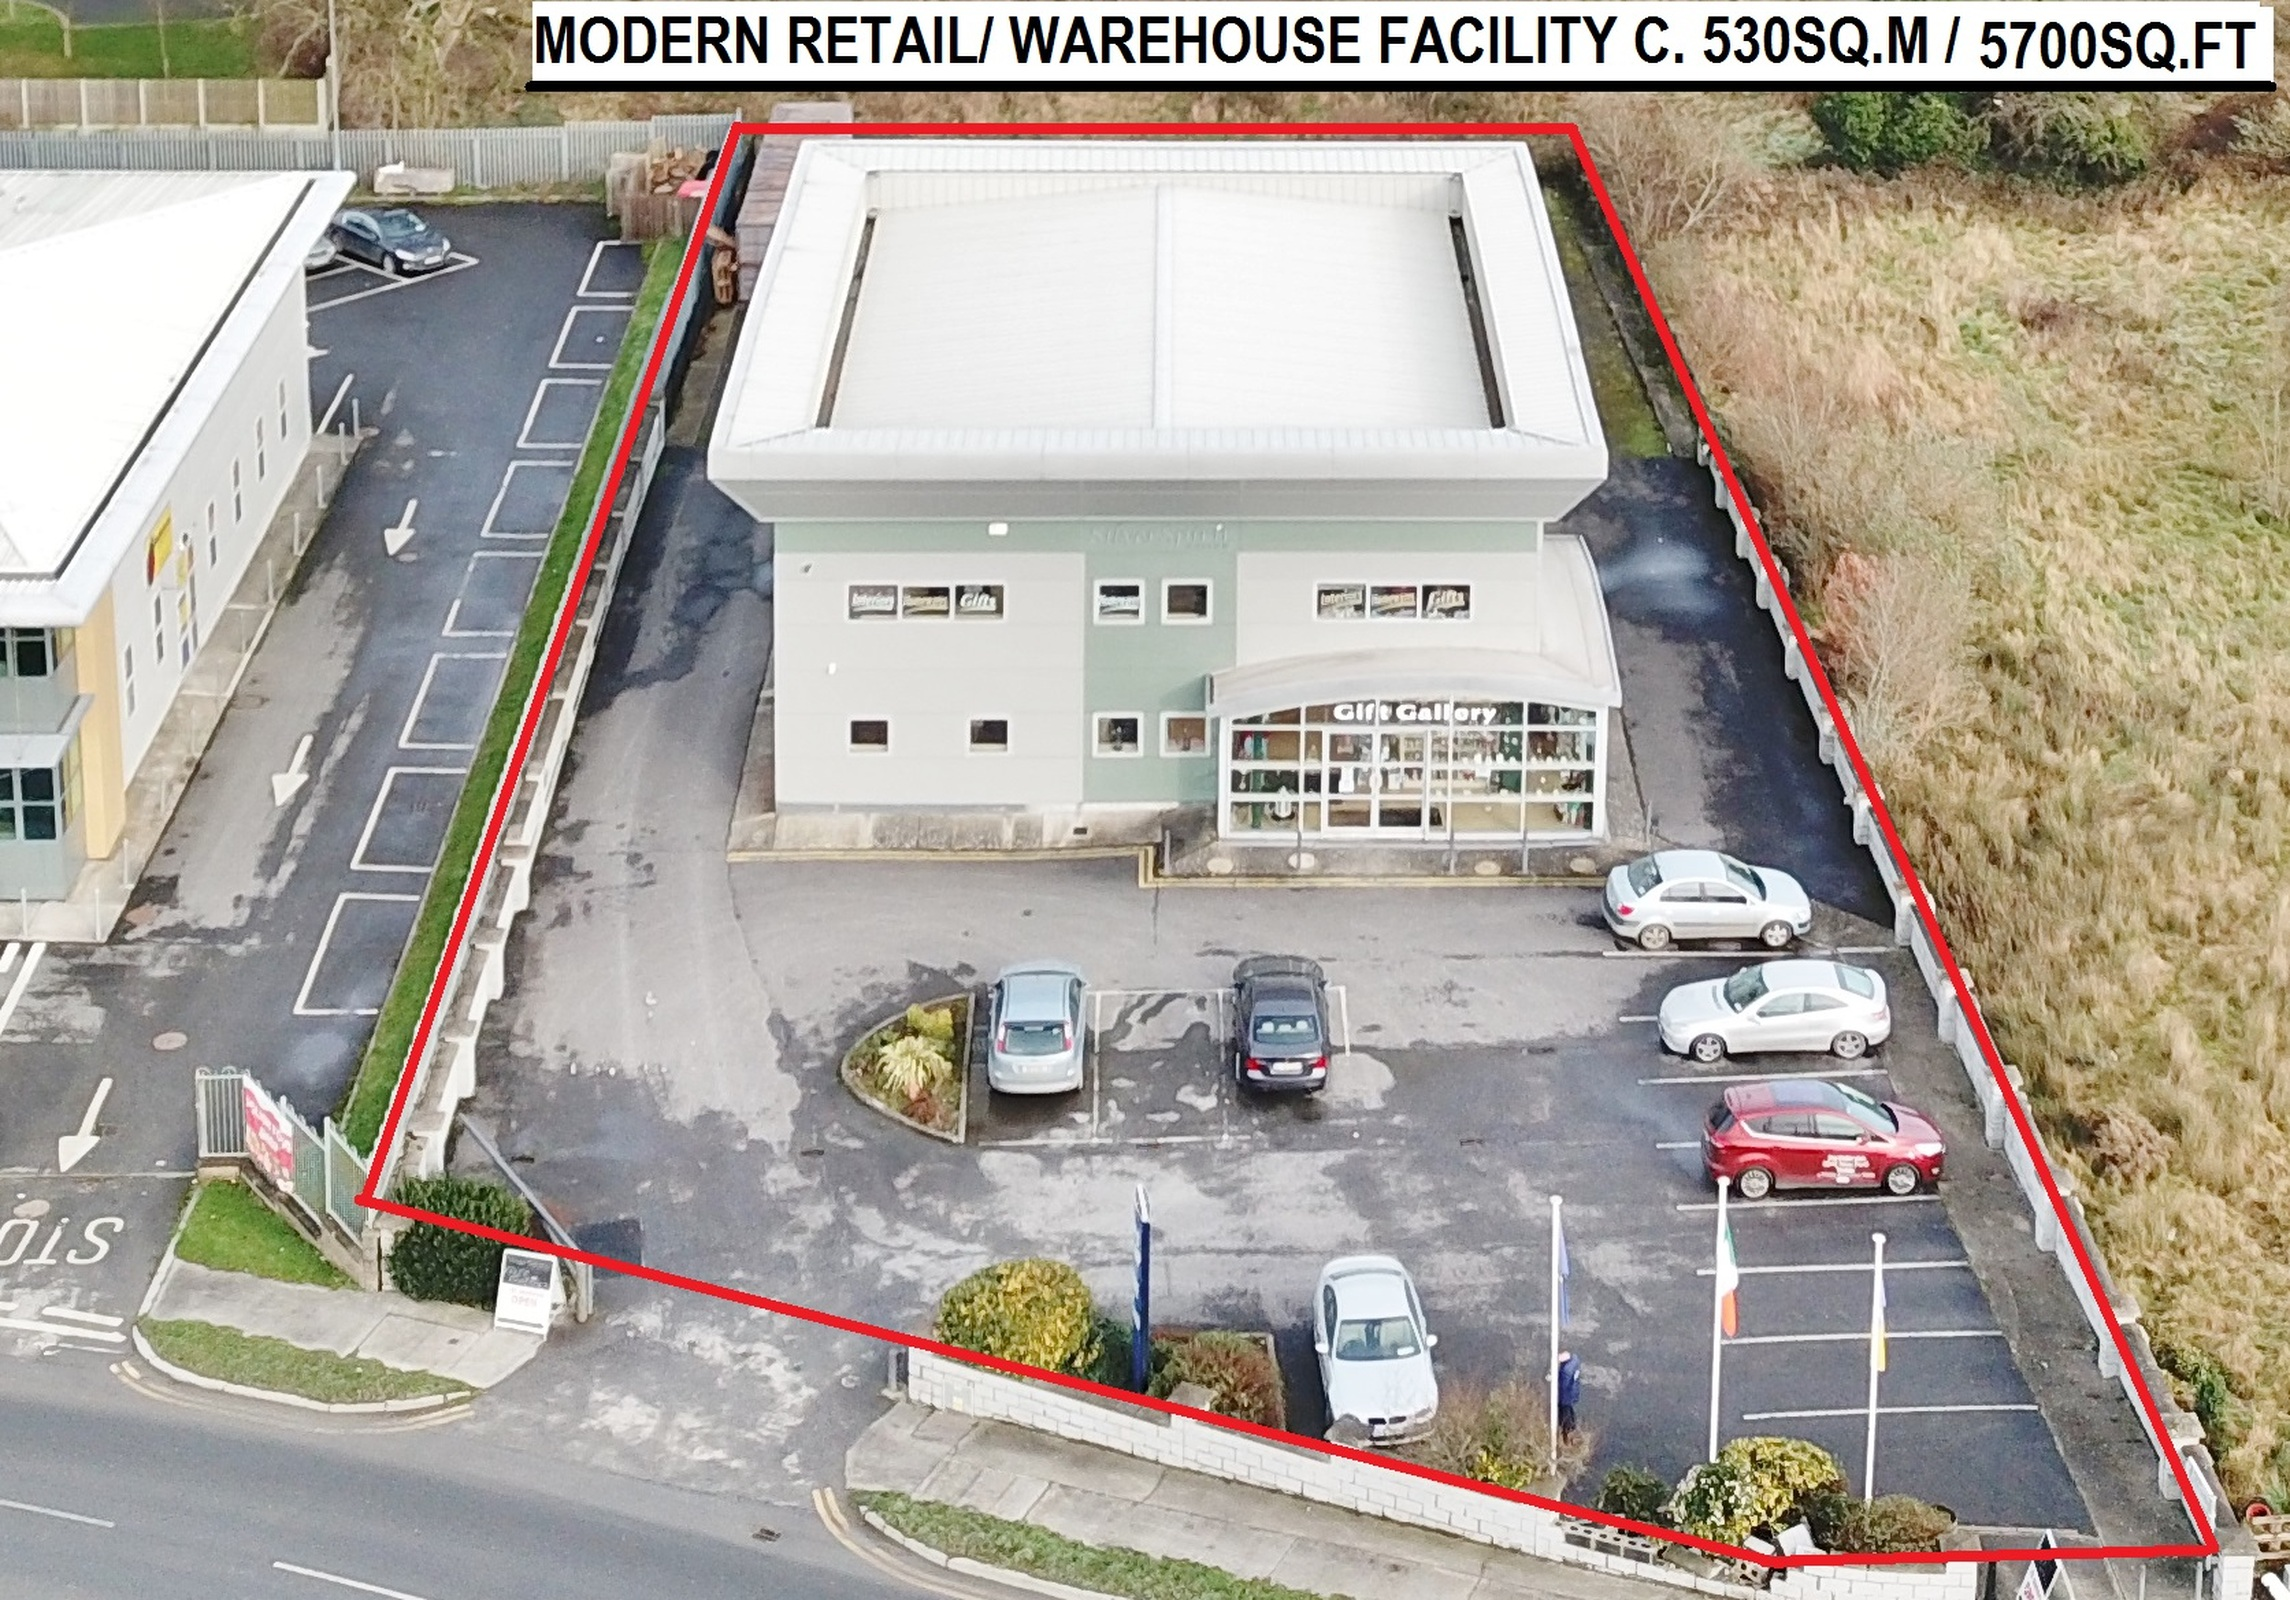 Modern Retail/ Warehouse Facility C. 530 Sq. M/ 5,700 Sq. Ft., On 0.47 Acres/0.2 Ha., Blessington Bu